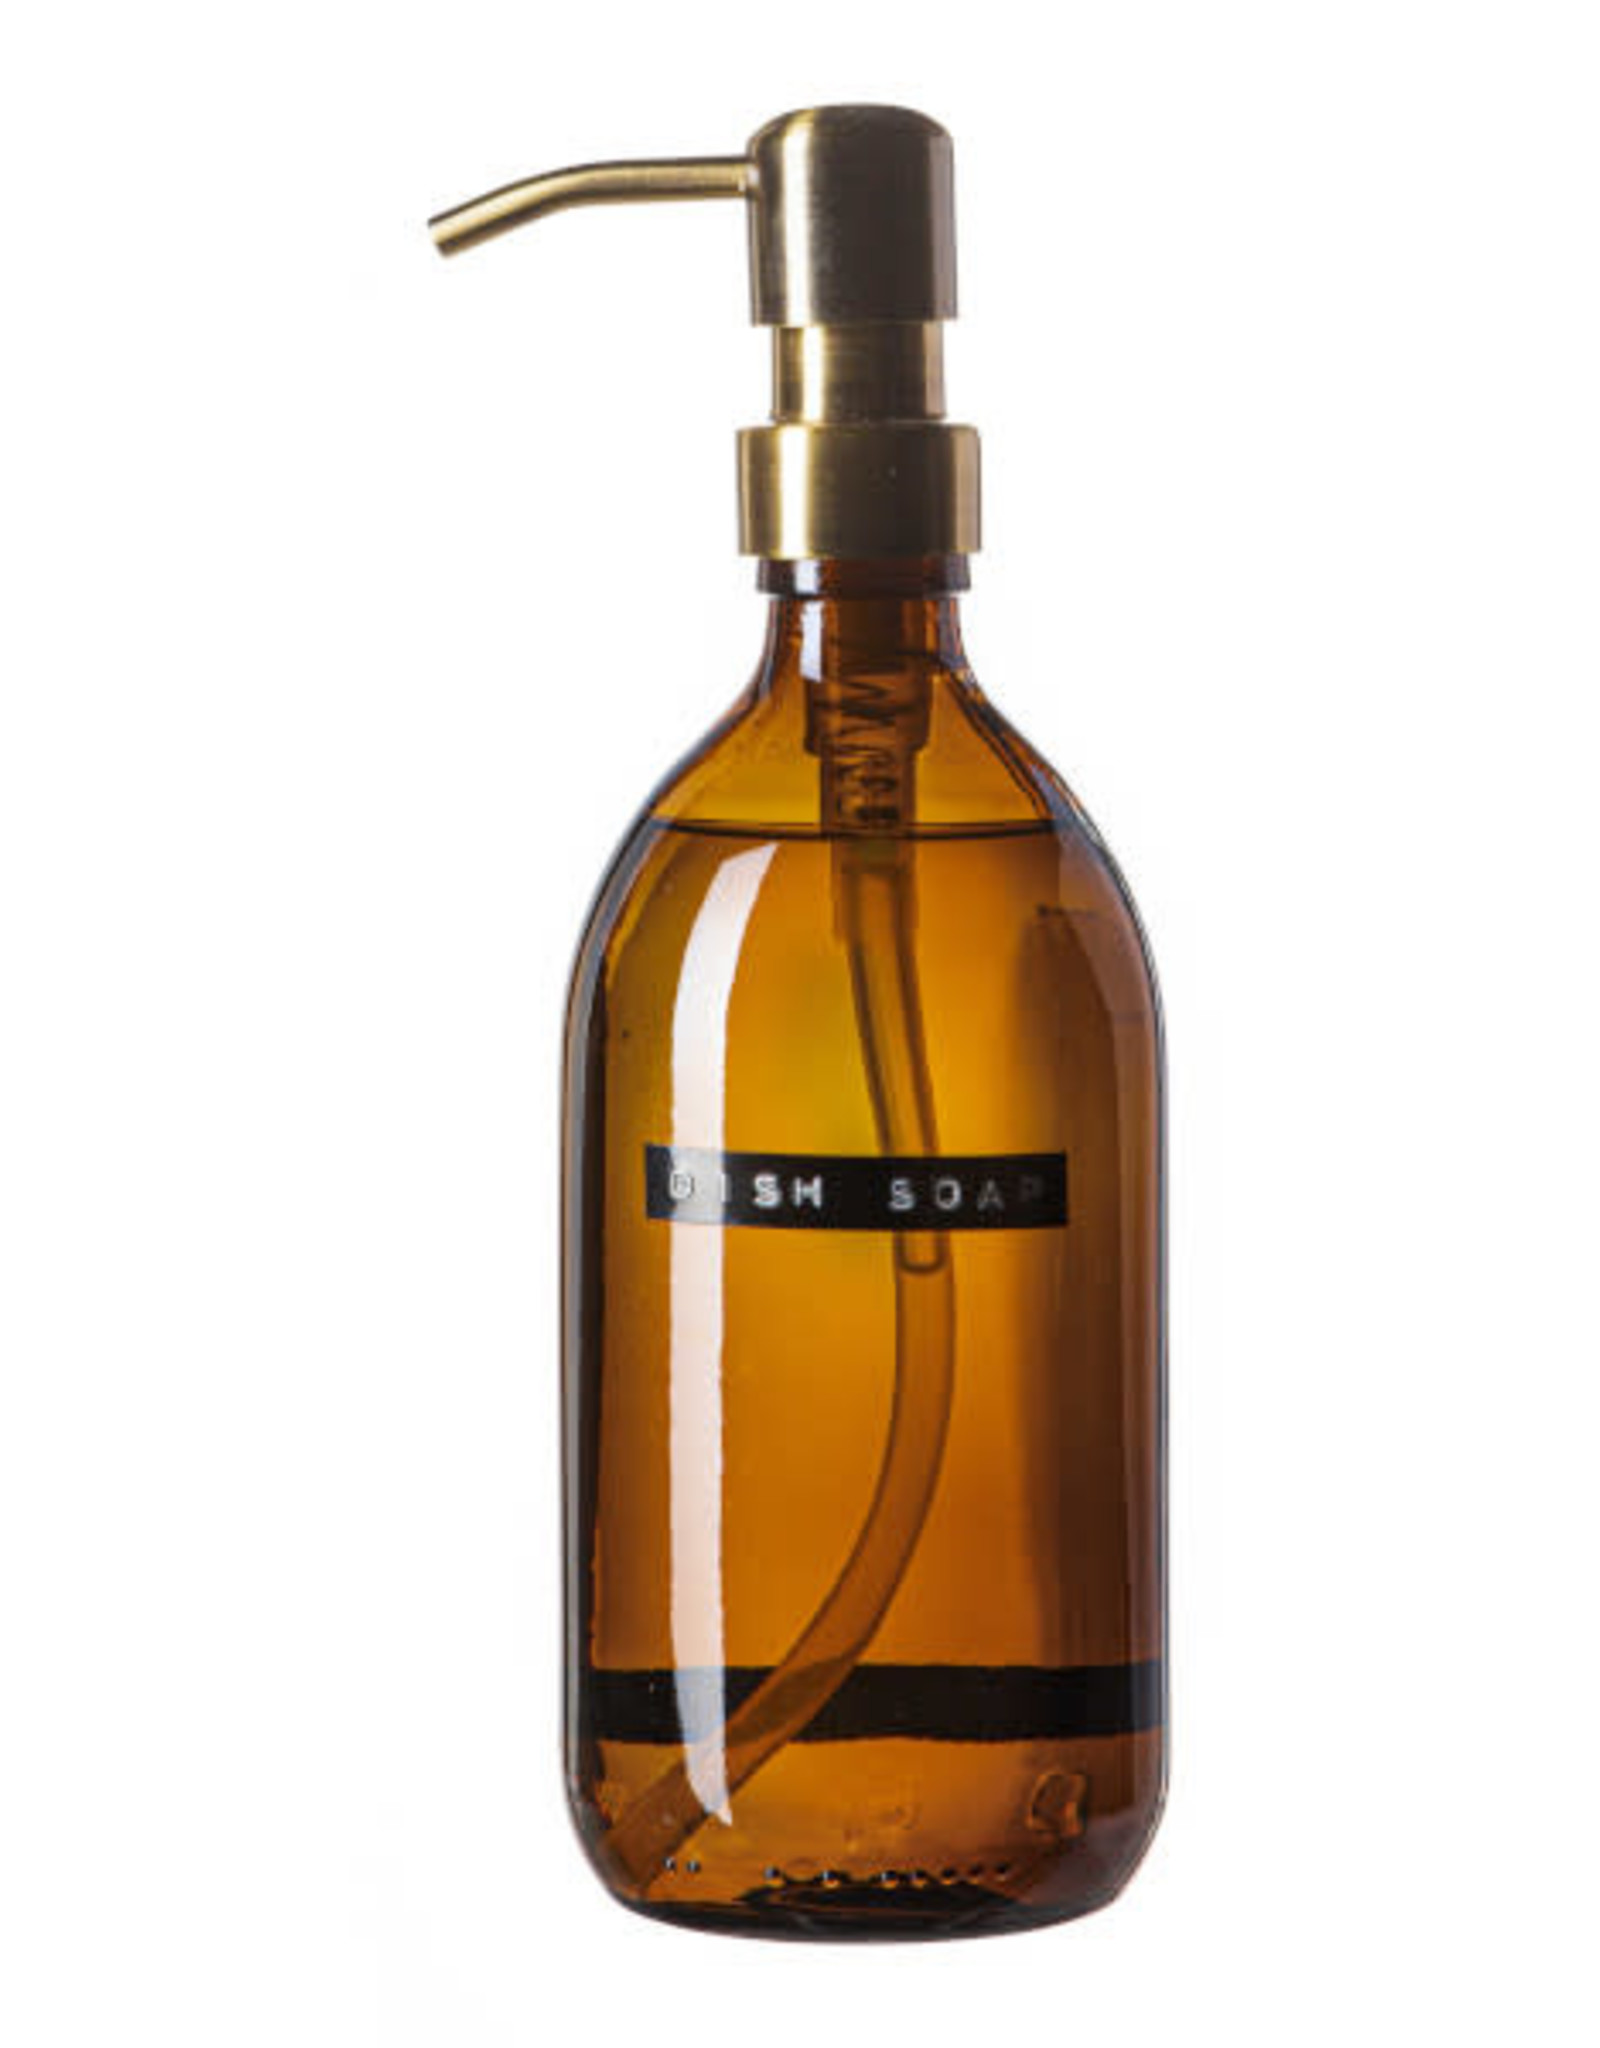 Wellmark Afwasmiddel  500ml  bruin glas / brass dop